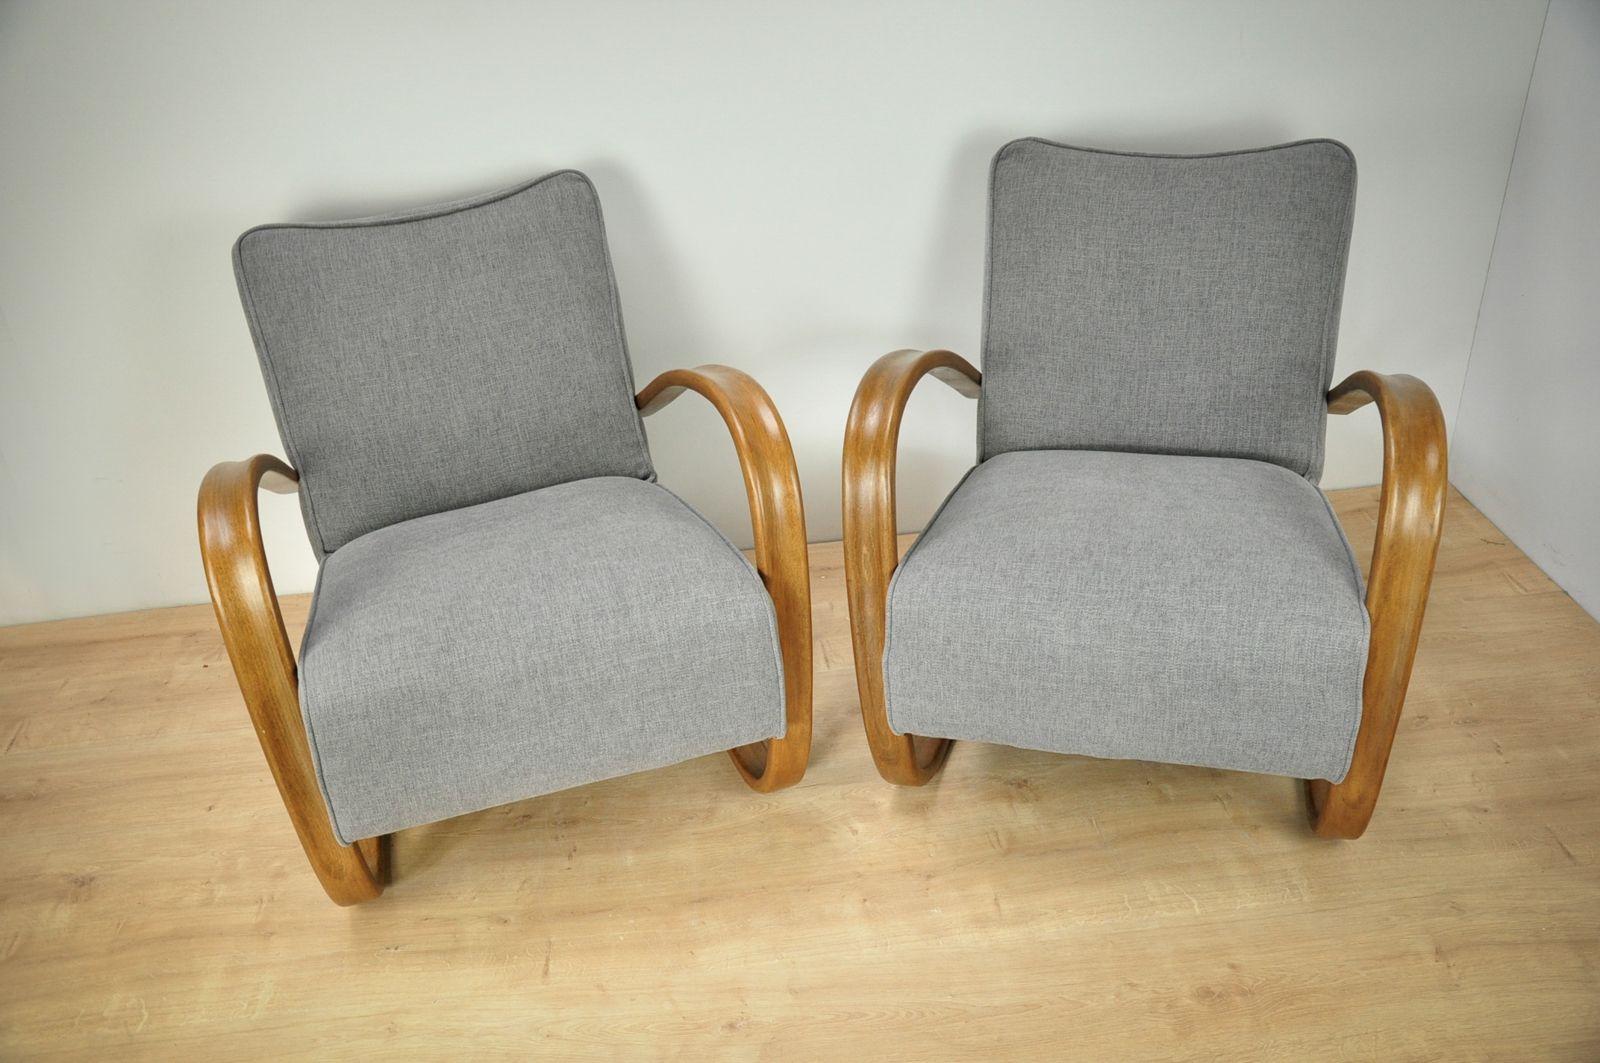 set-of-2-vintage-armchairs-h-269-by-jindřich-halabala-for-up-závody2